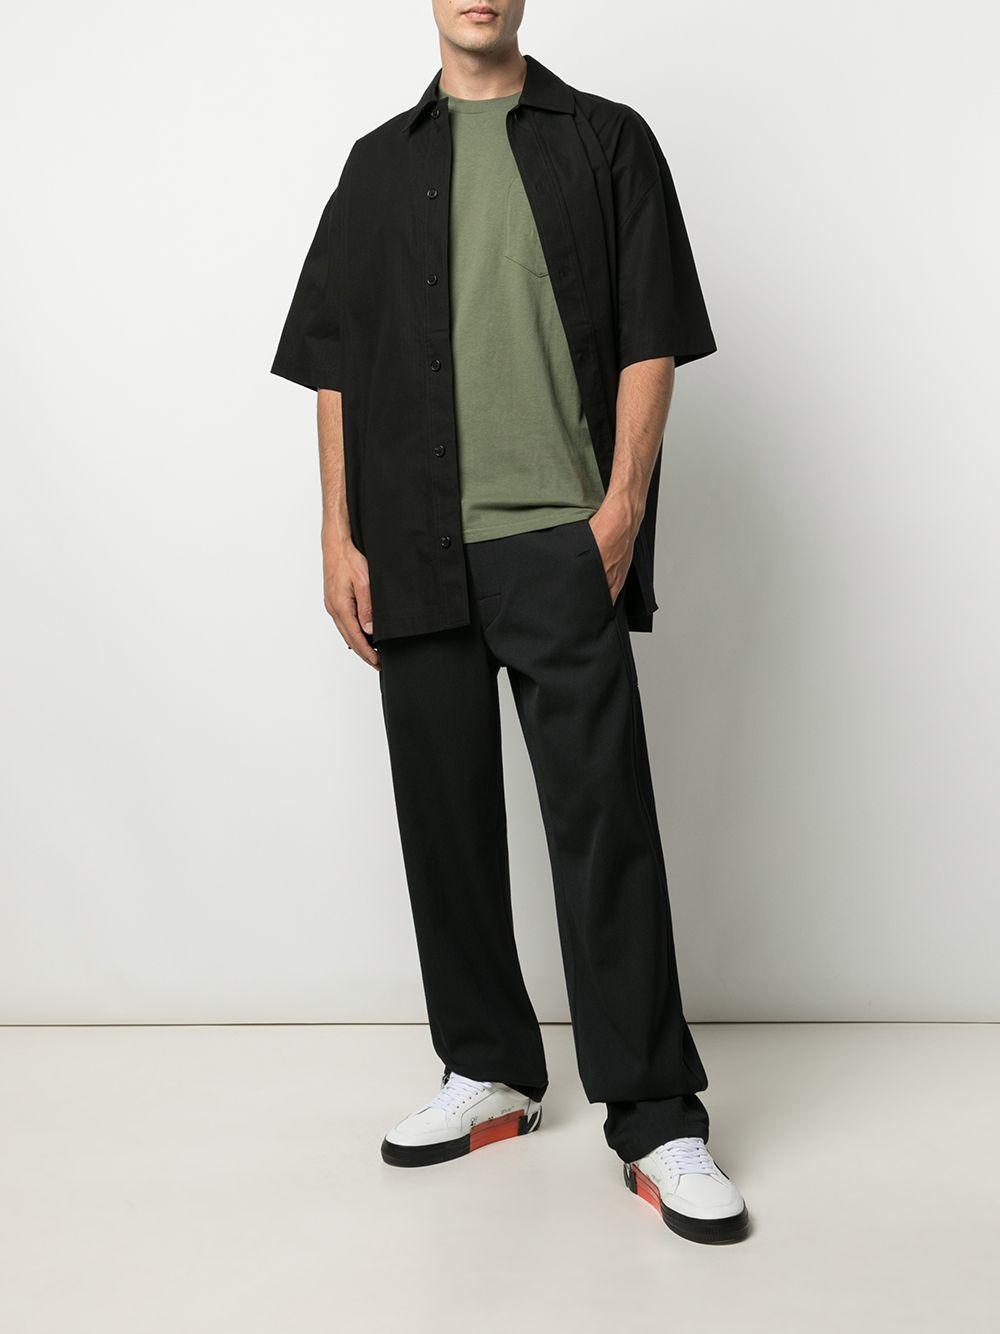 Pocket t-shirt man green cotton CARHARTT WIP | T-shirts | I022091667.00